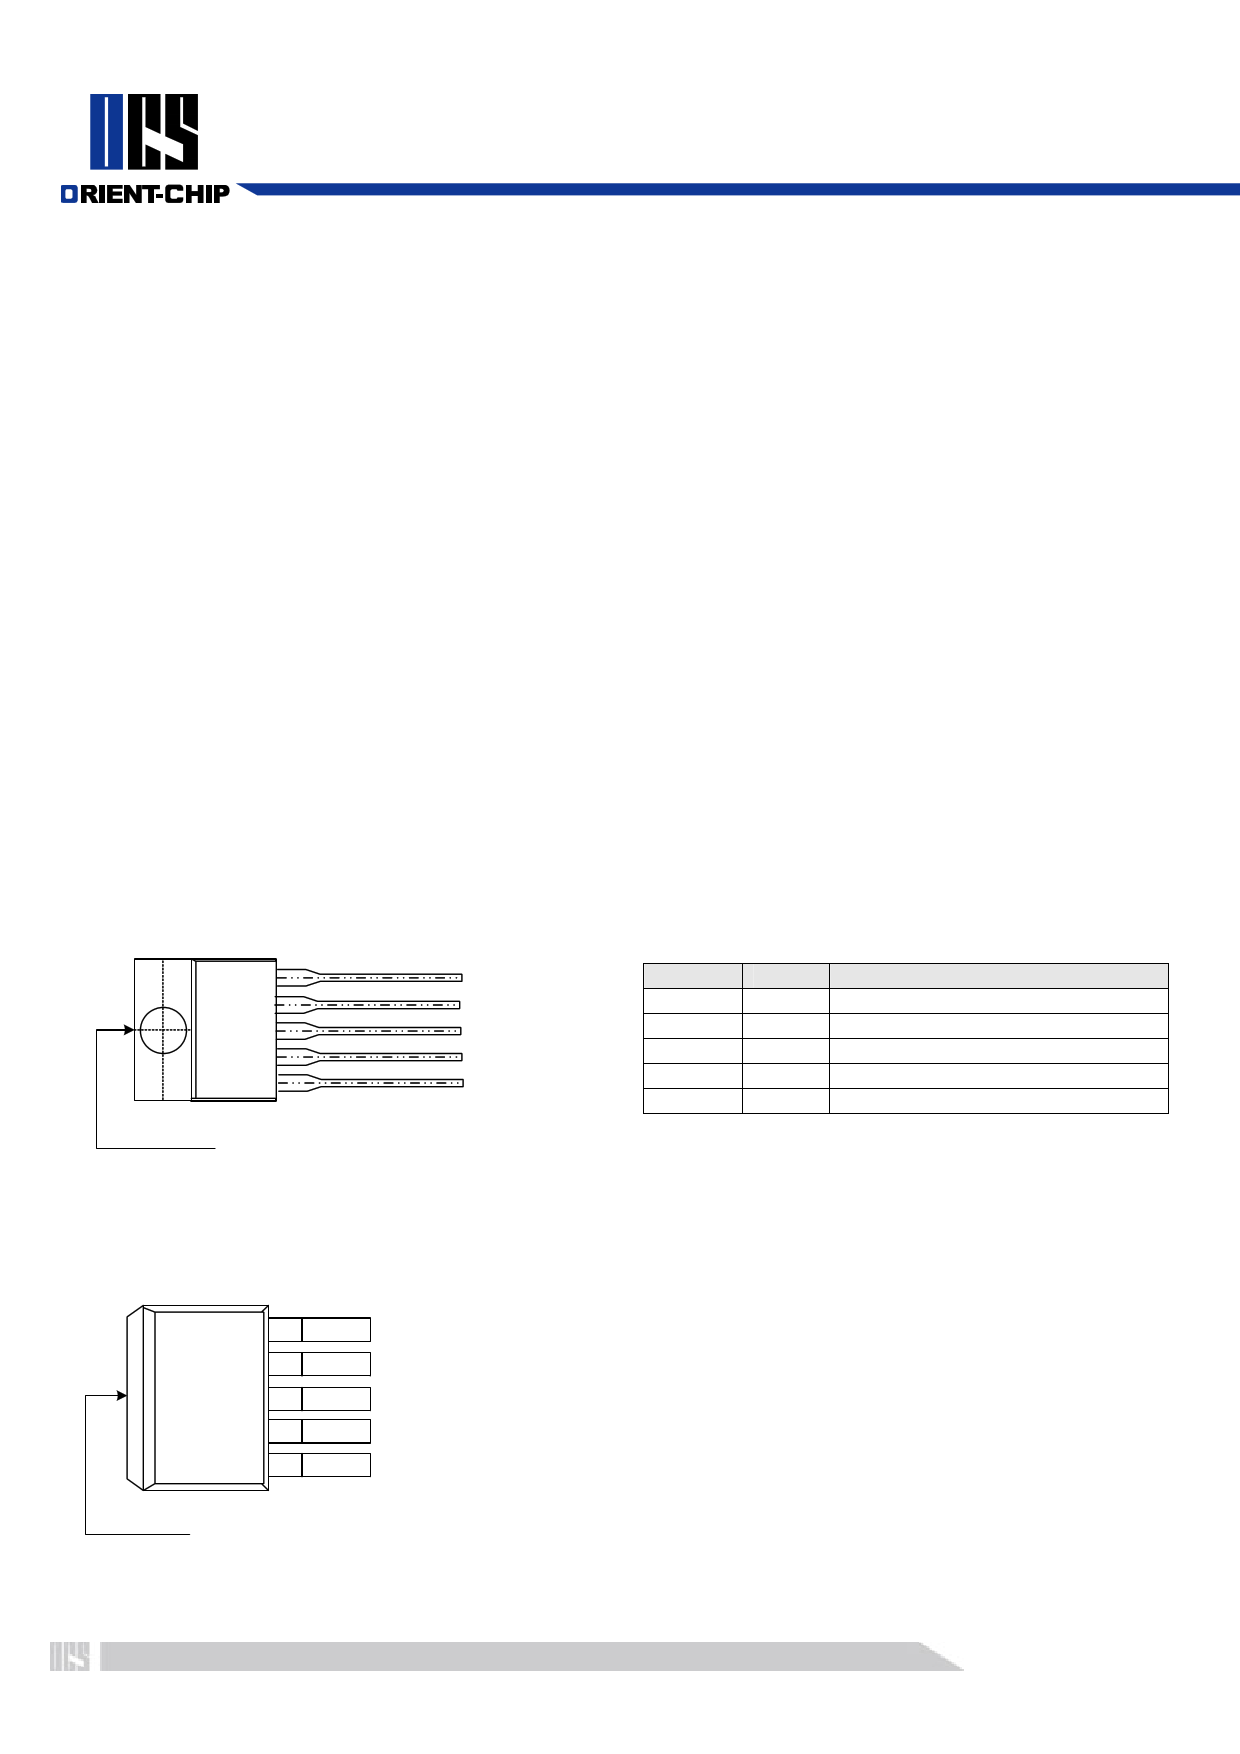 OCP2576 Datenblatt PDF